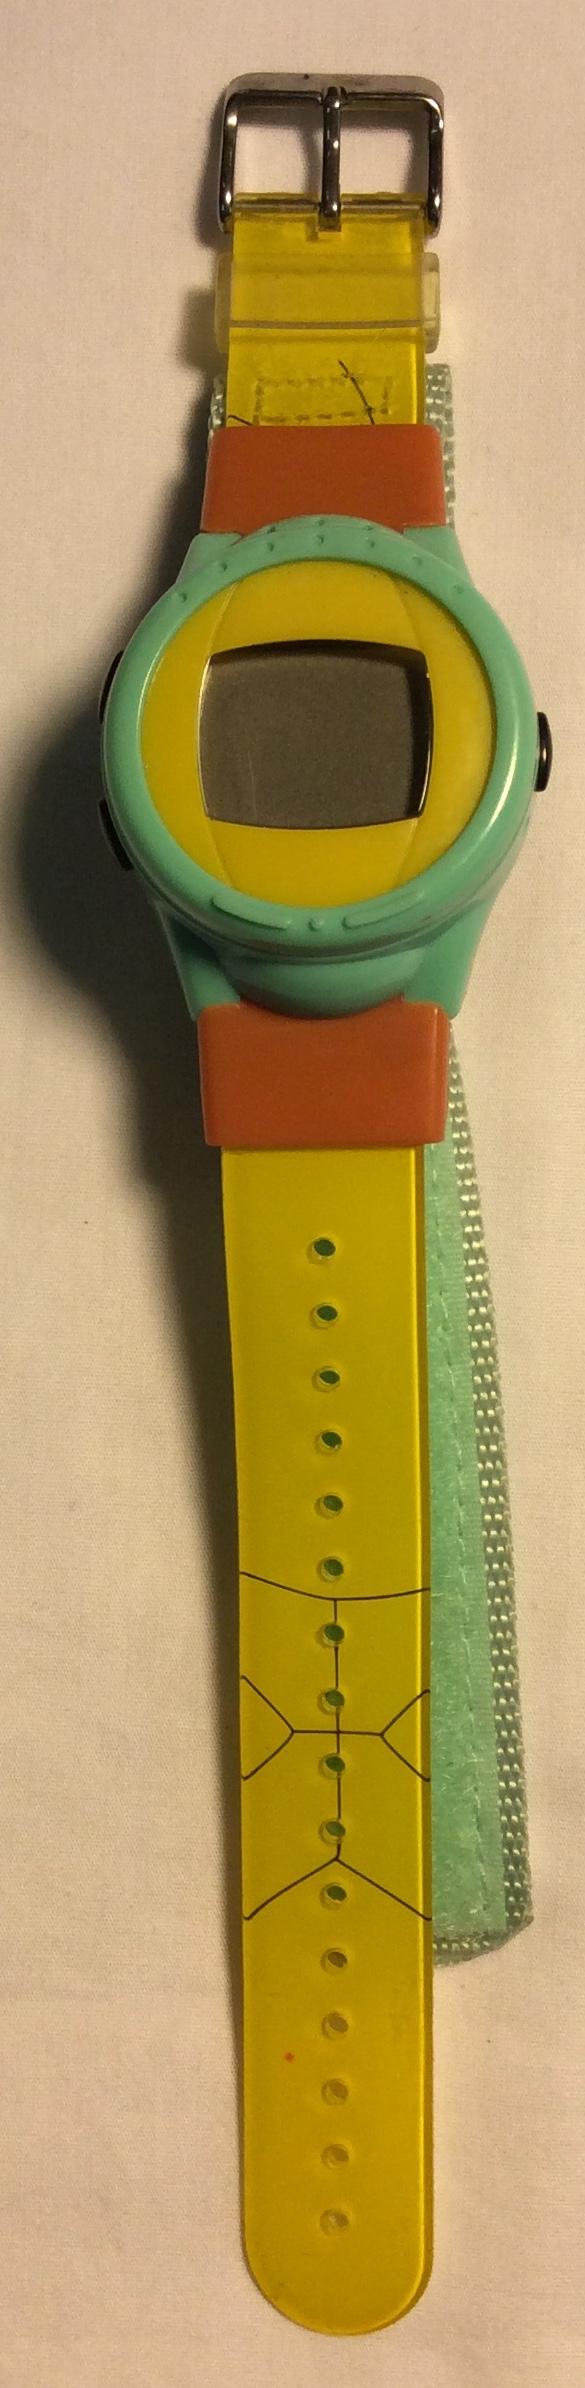 Digitall Watch